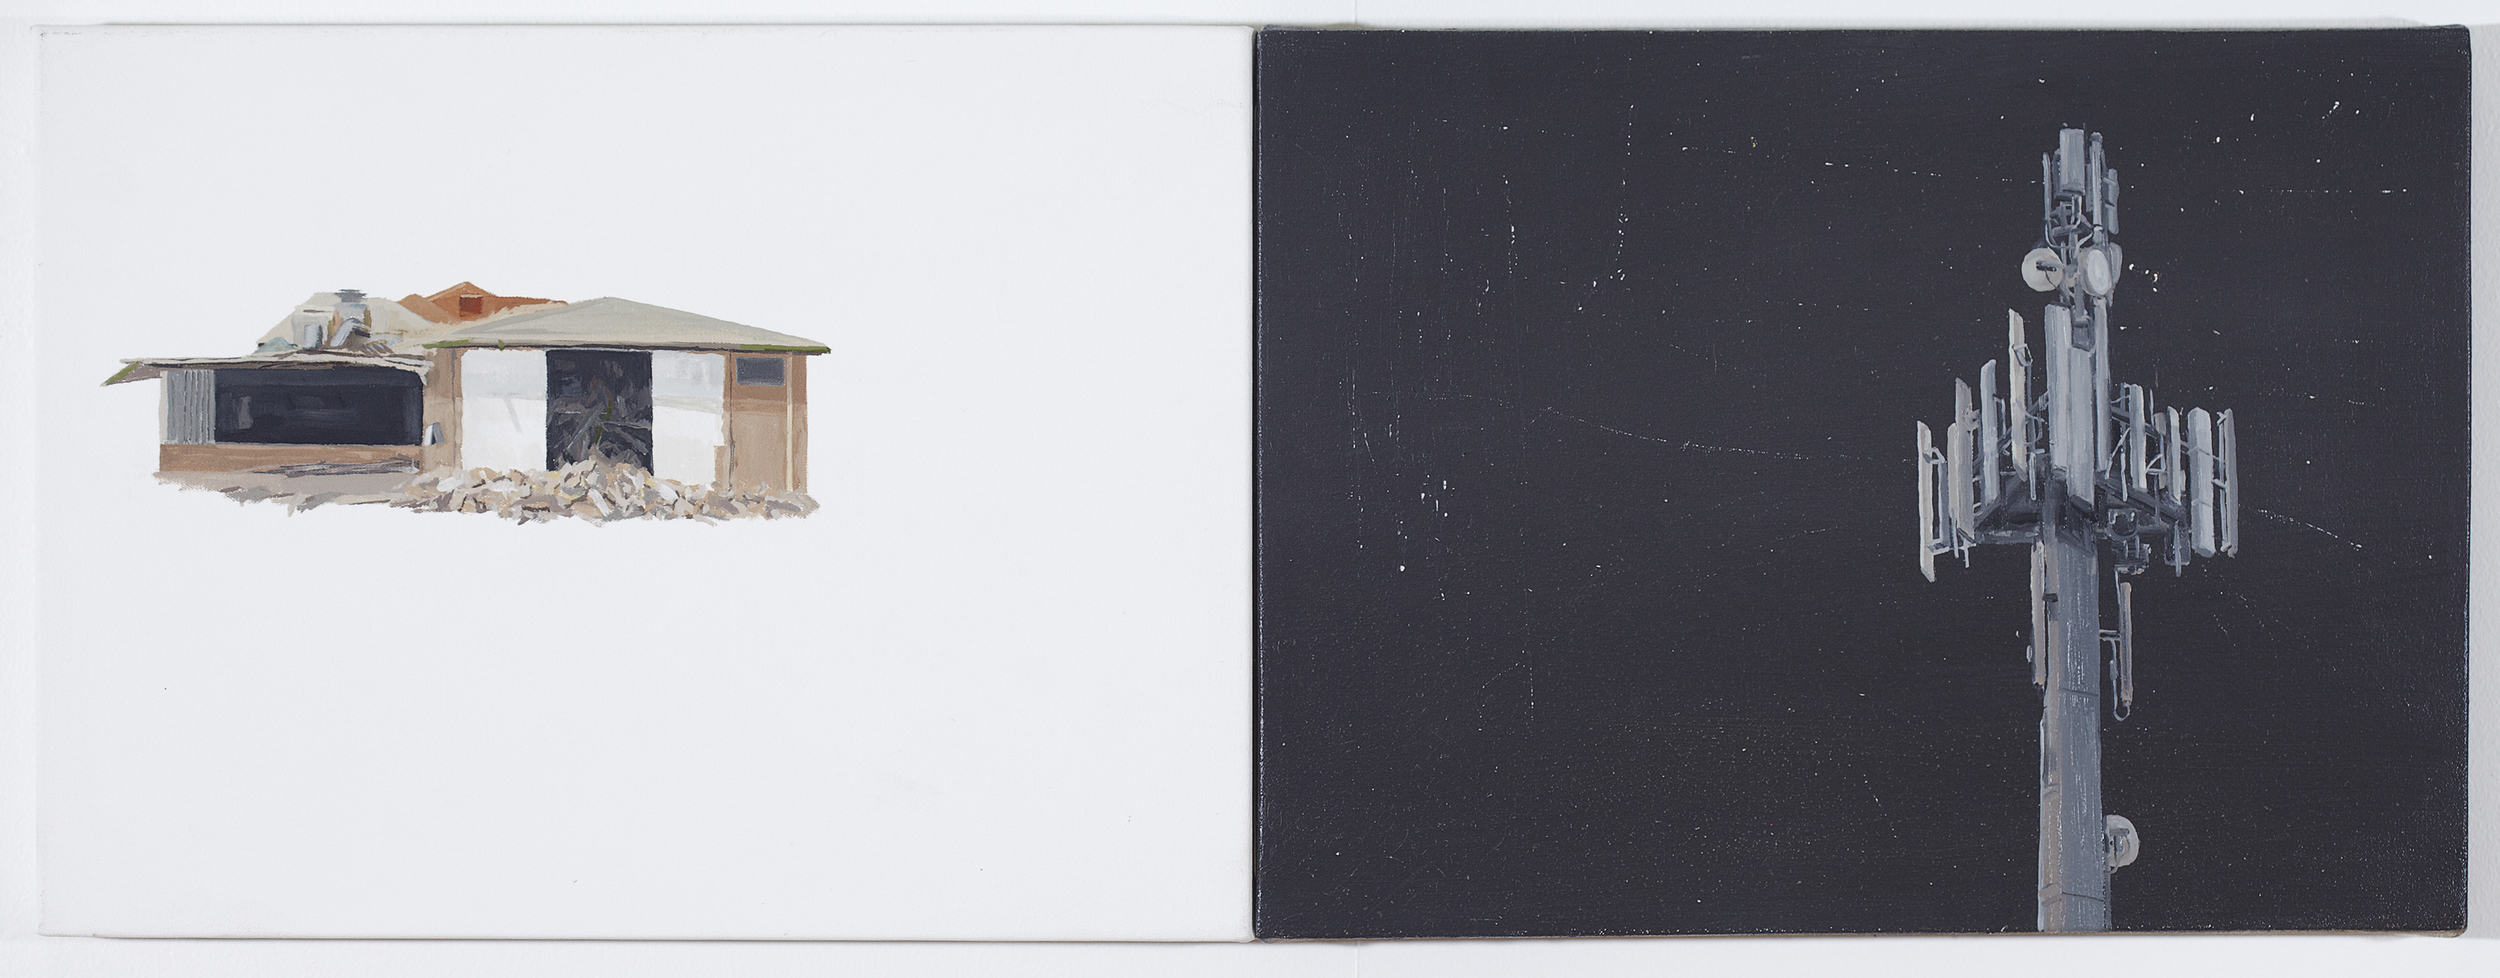 Satelite 2012 Oil on Canvas 31 x 82cm